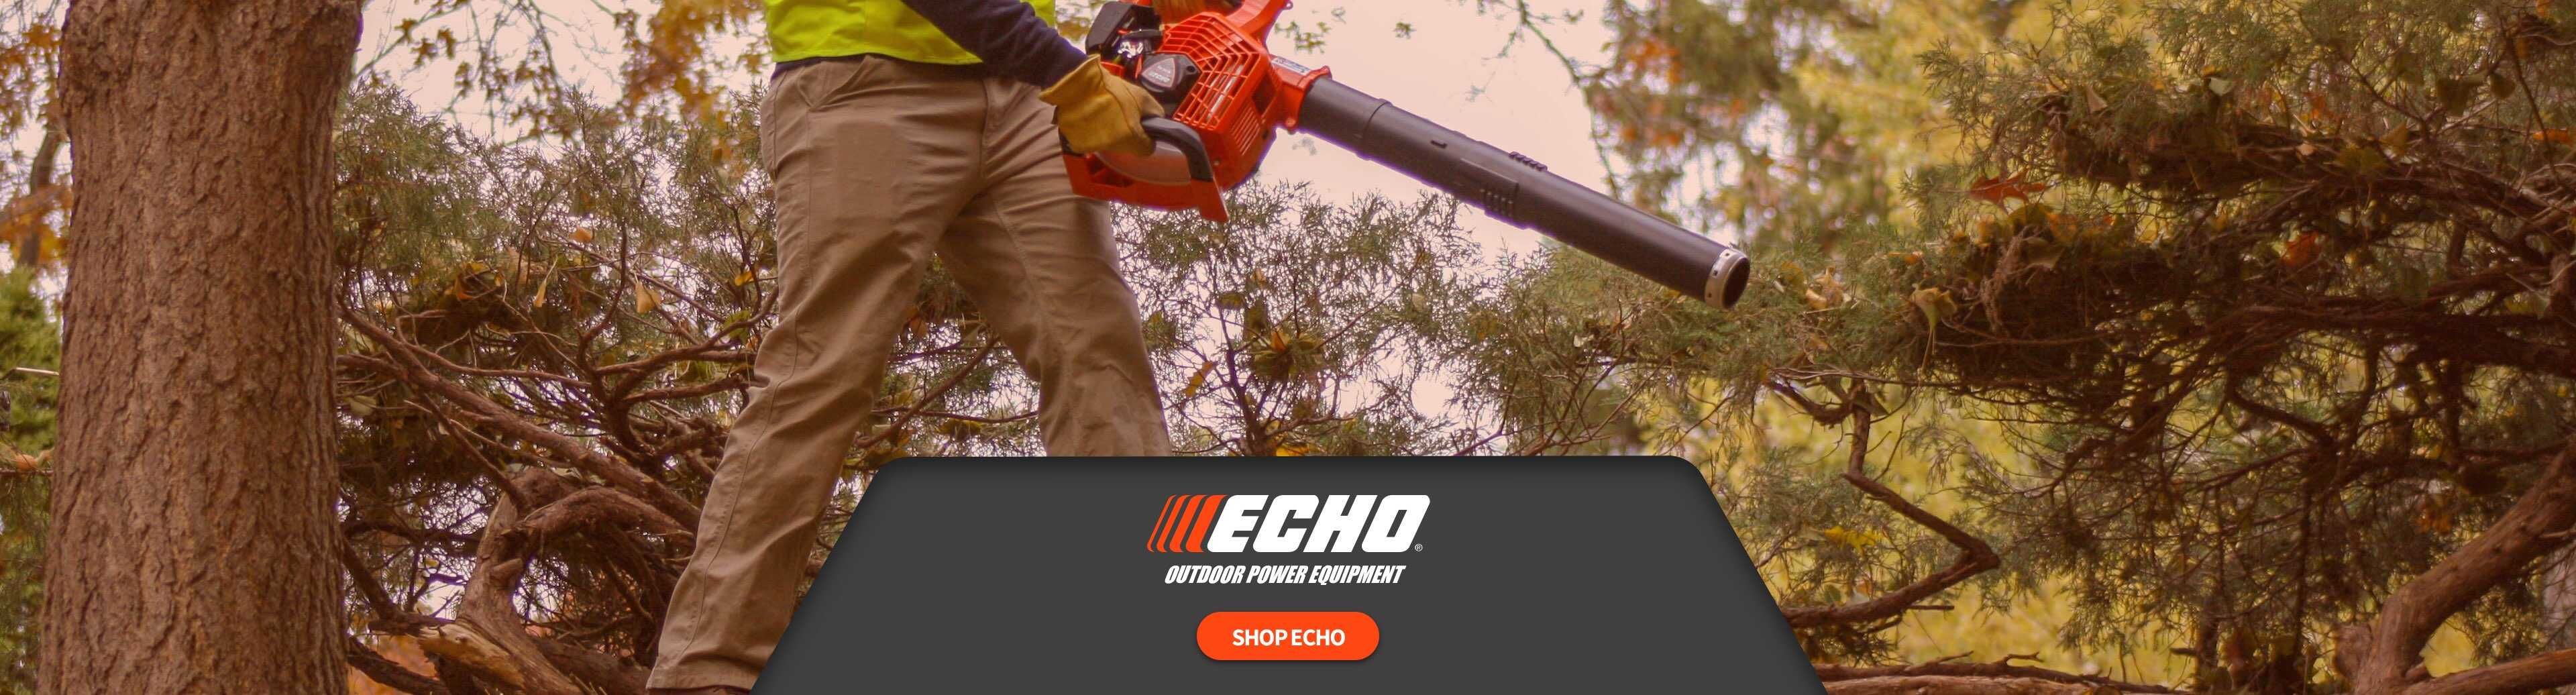 Shop Echo Power Equipment at Jerrys